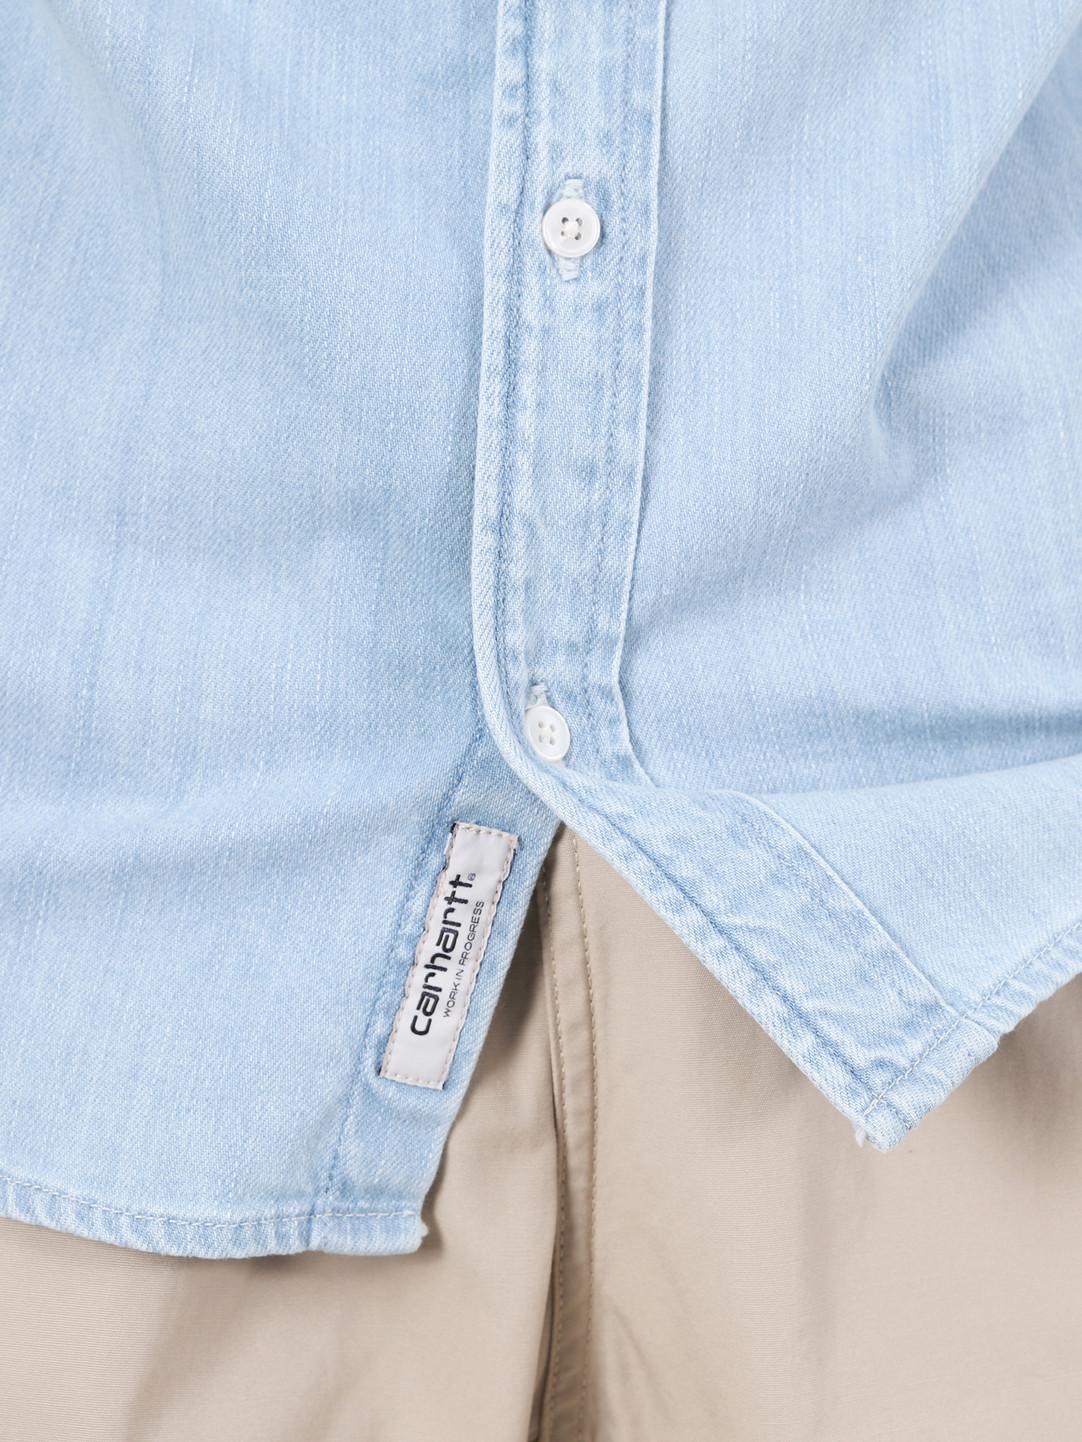 Carhartt WIP Carhartt WIP Civil Shirt Blue Bleached I027984-135